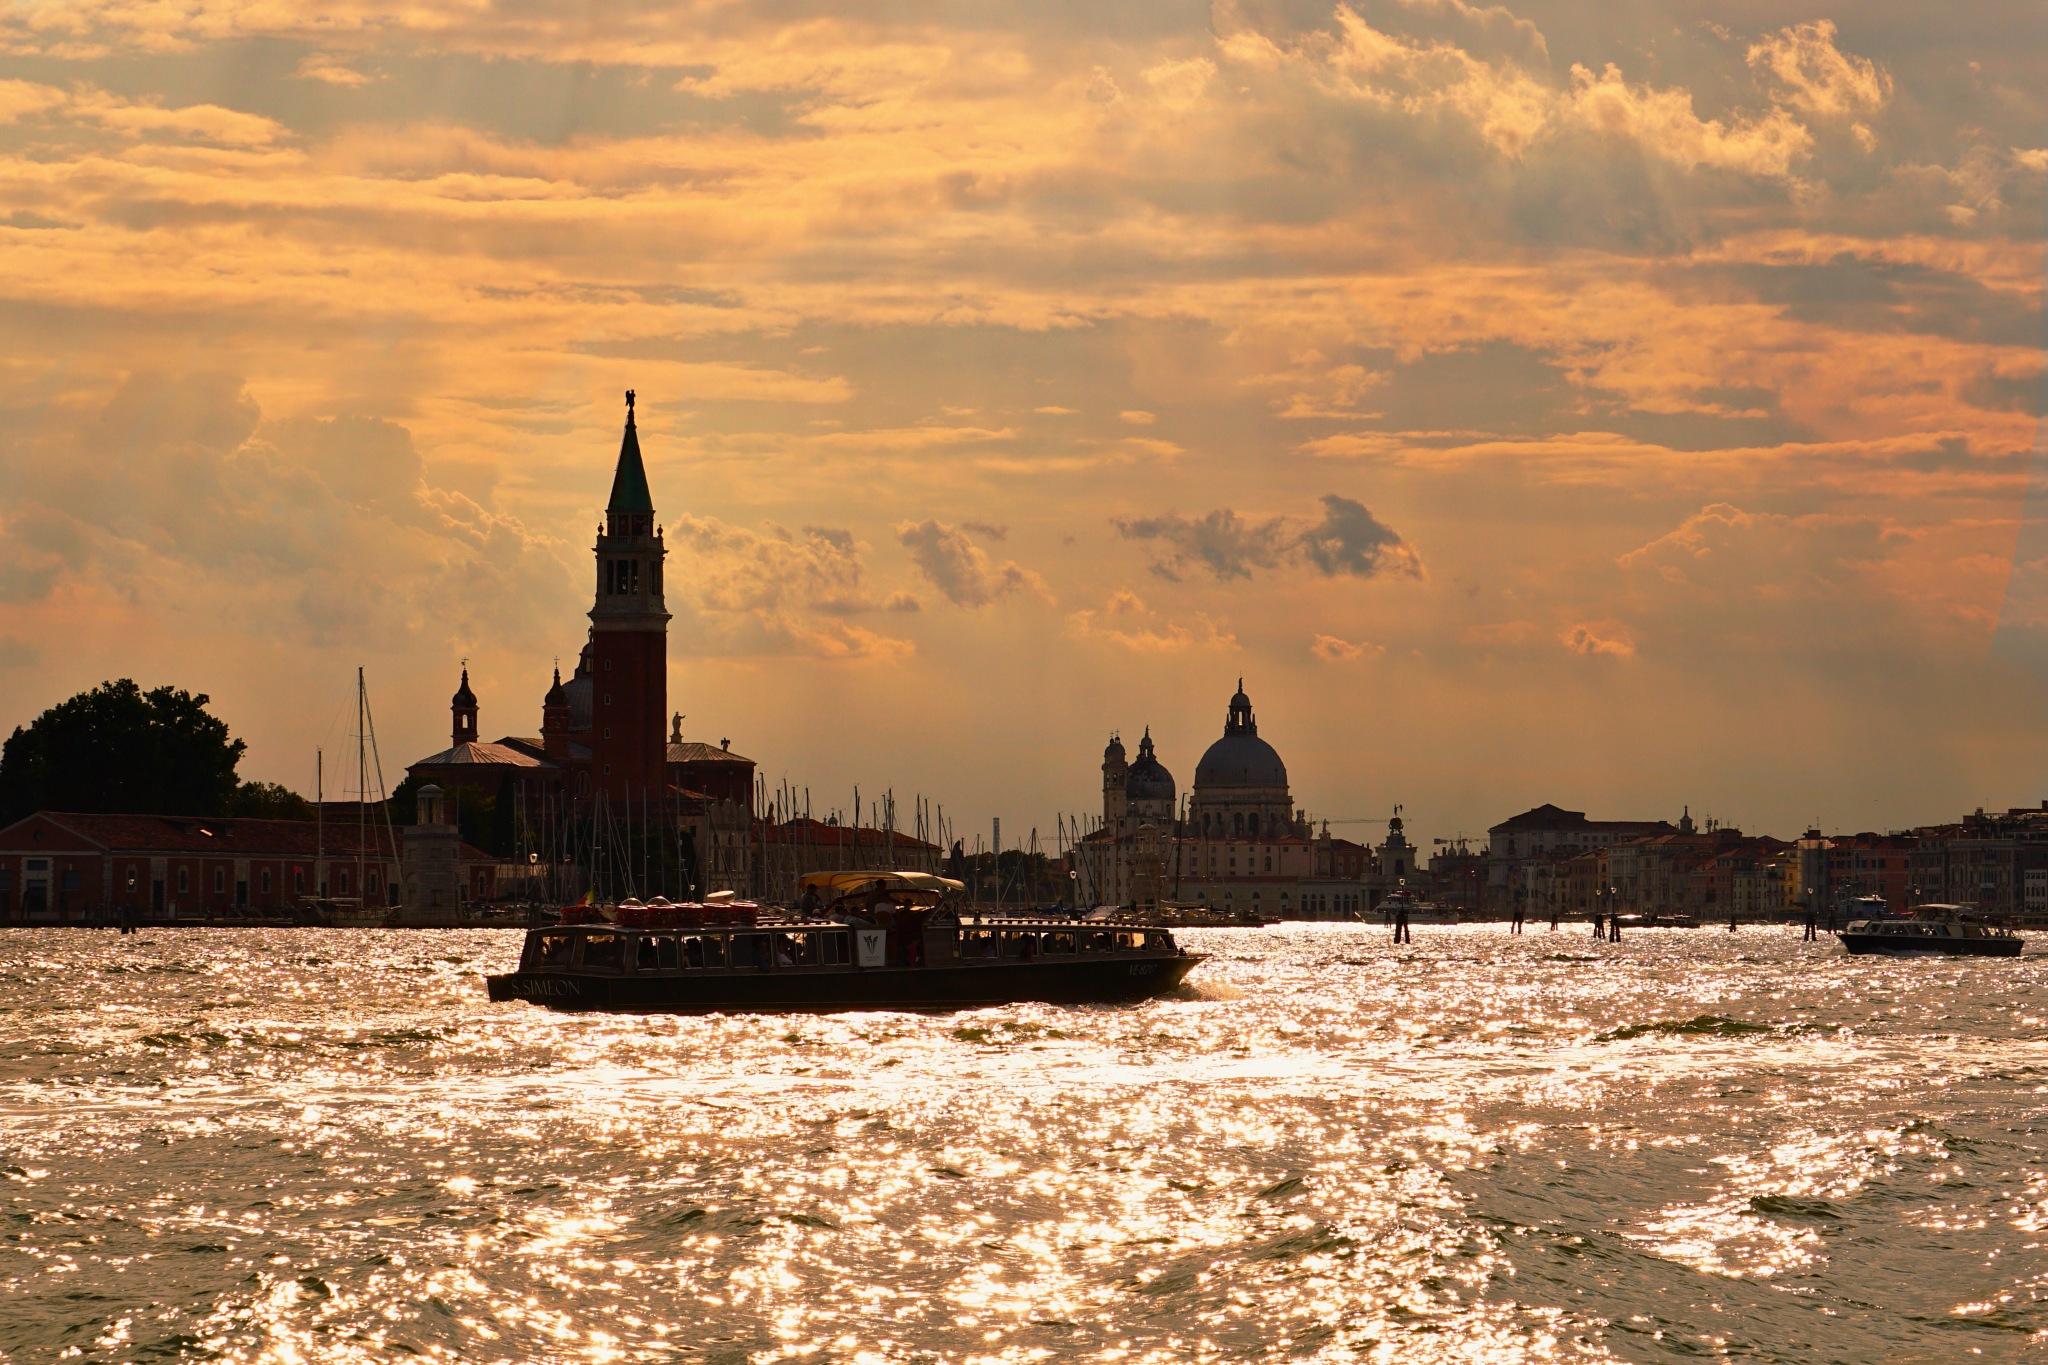 Sunset at Venice by Poul-Erik Olsen